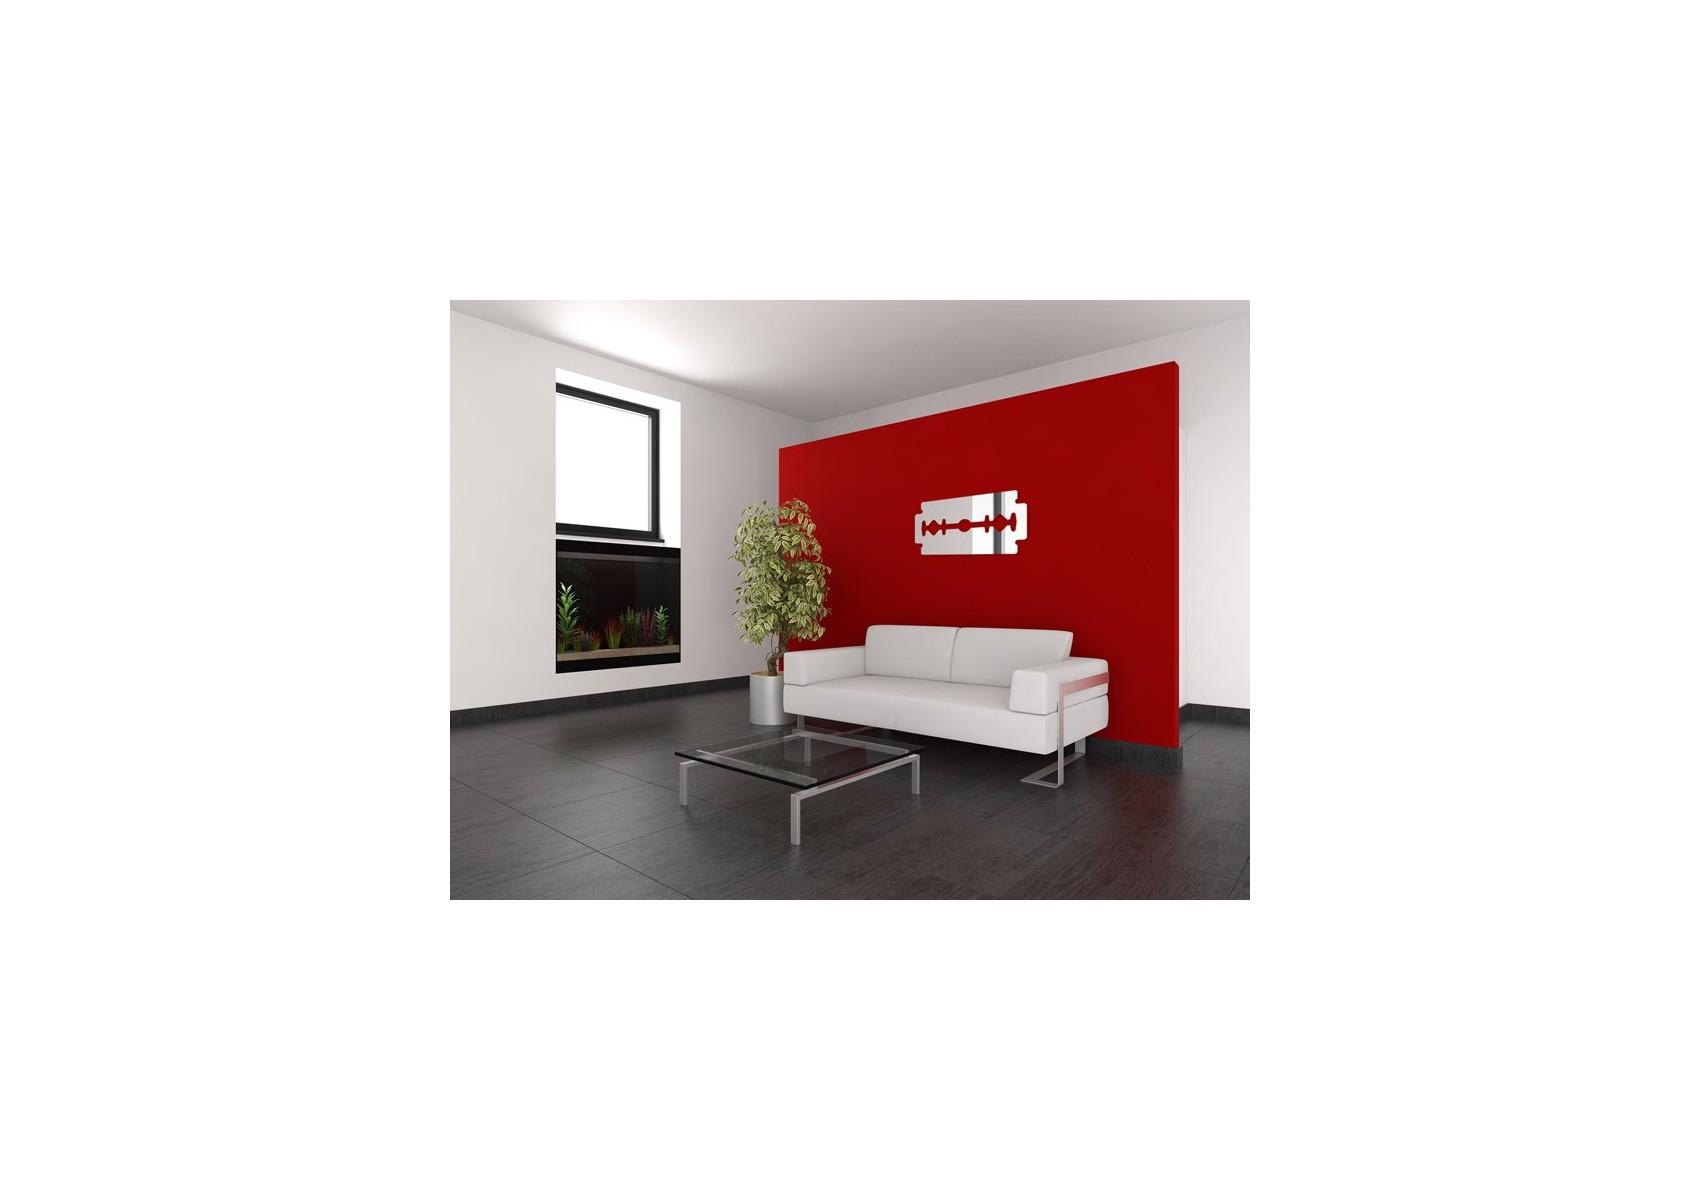 miroir original lame de rasoir en acrylique boite design. Black Bedroom Furniture Sets. Home Design Ideas